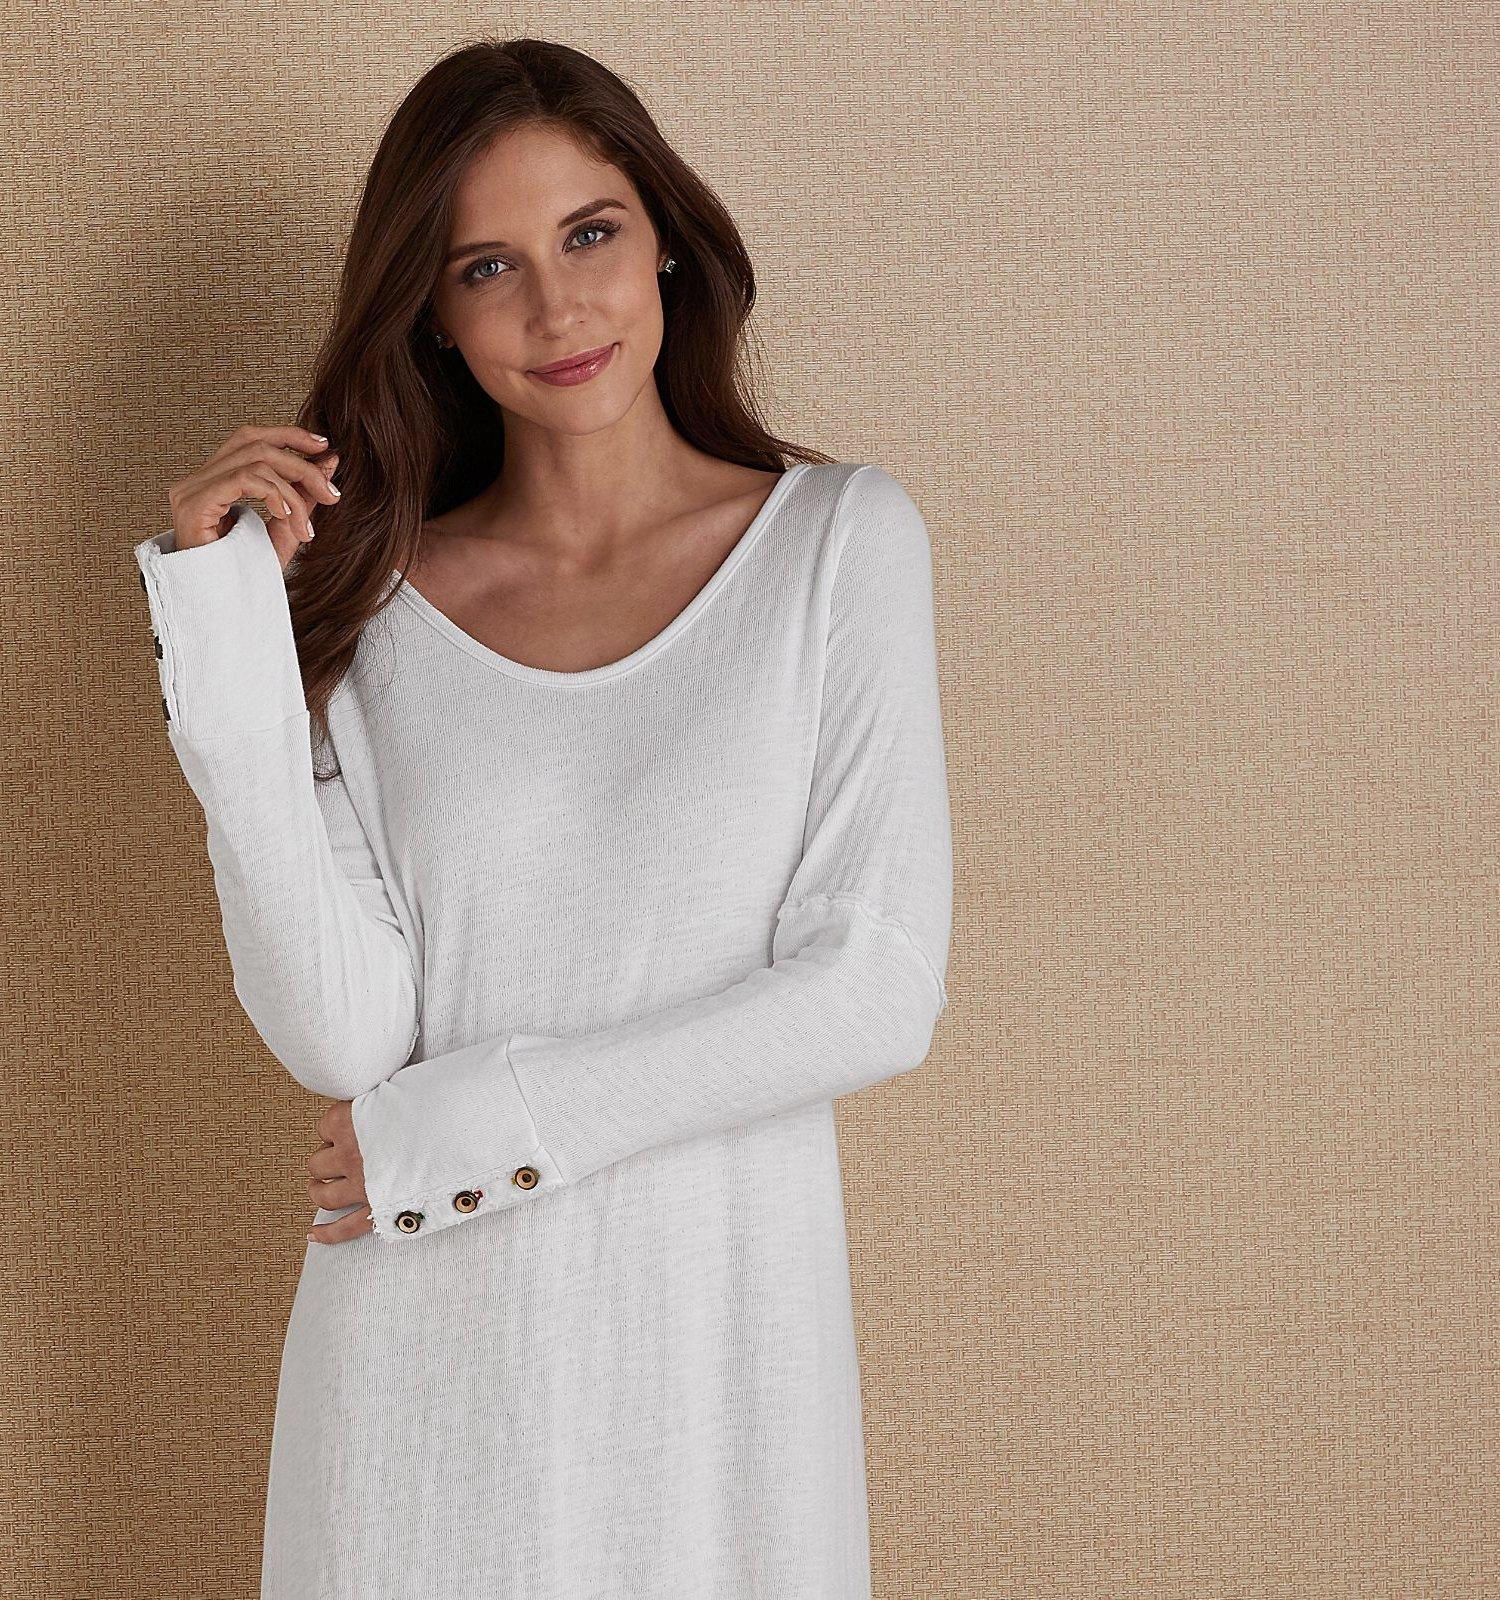 woman modeling soft surroundings clothing